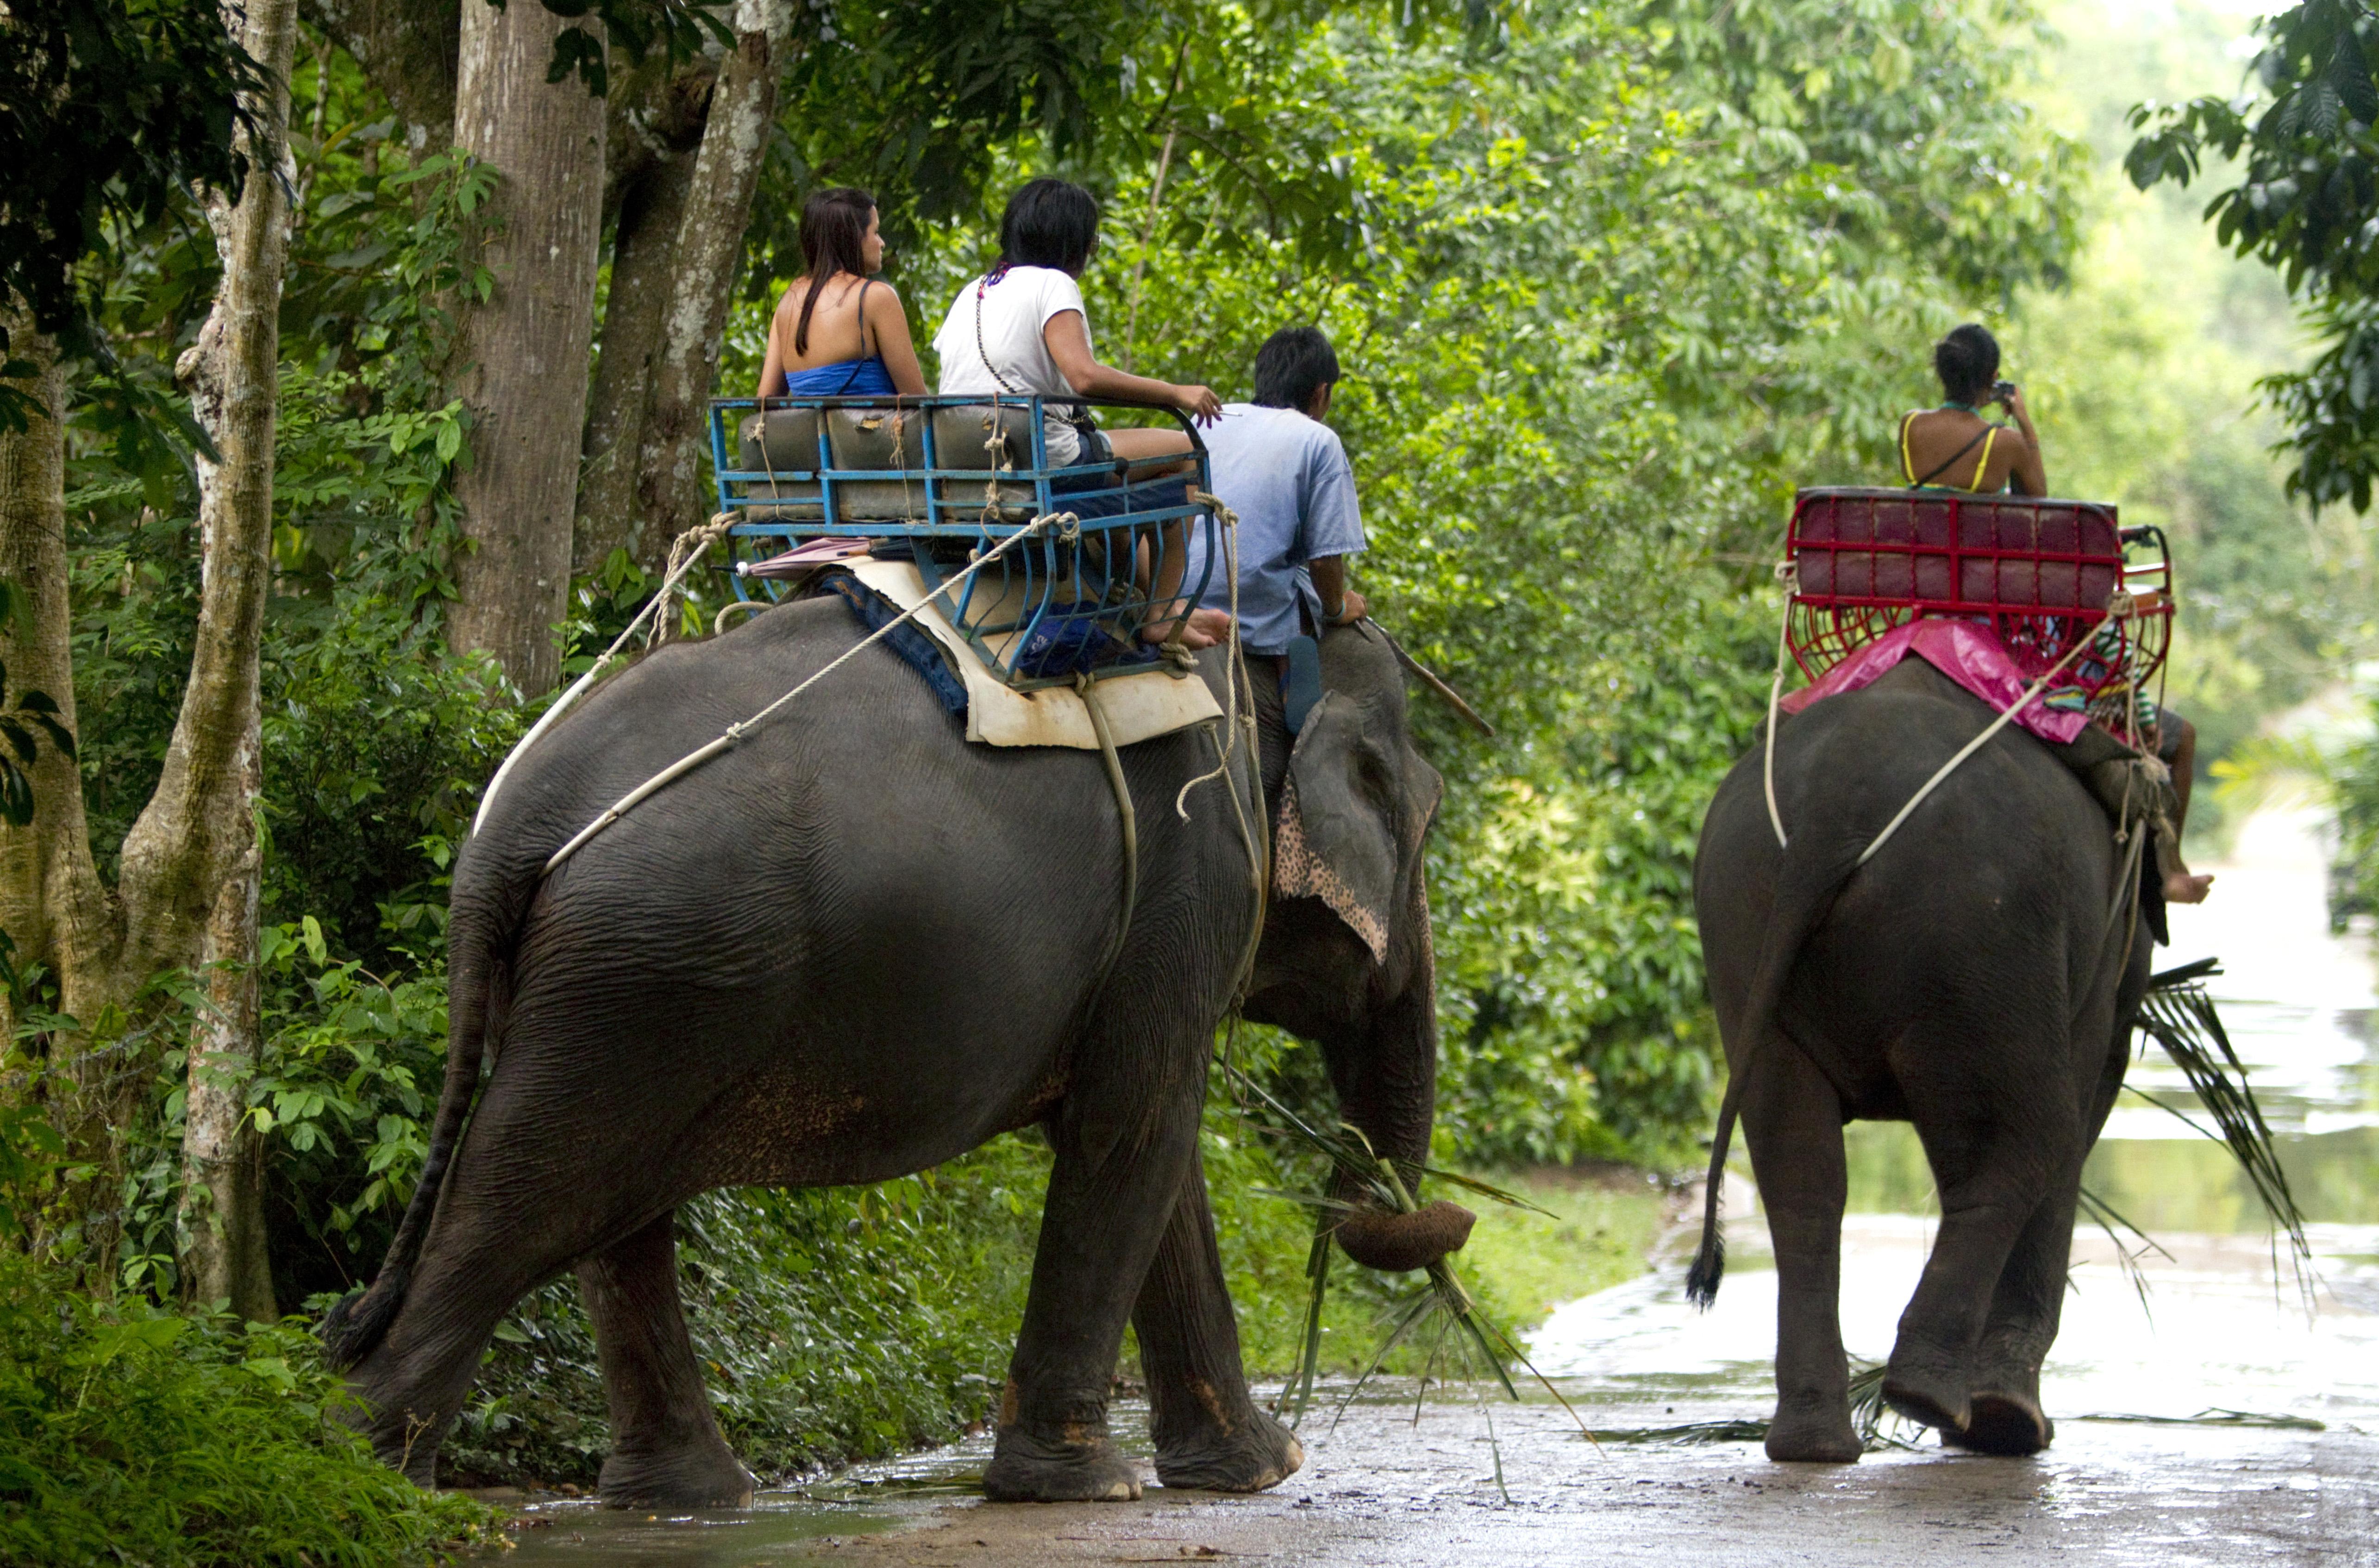 Tourists ride atop Asian elephants in Koh Samui, Thailand